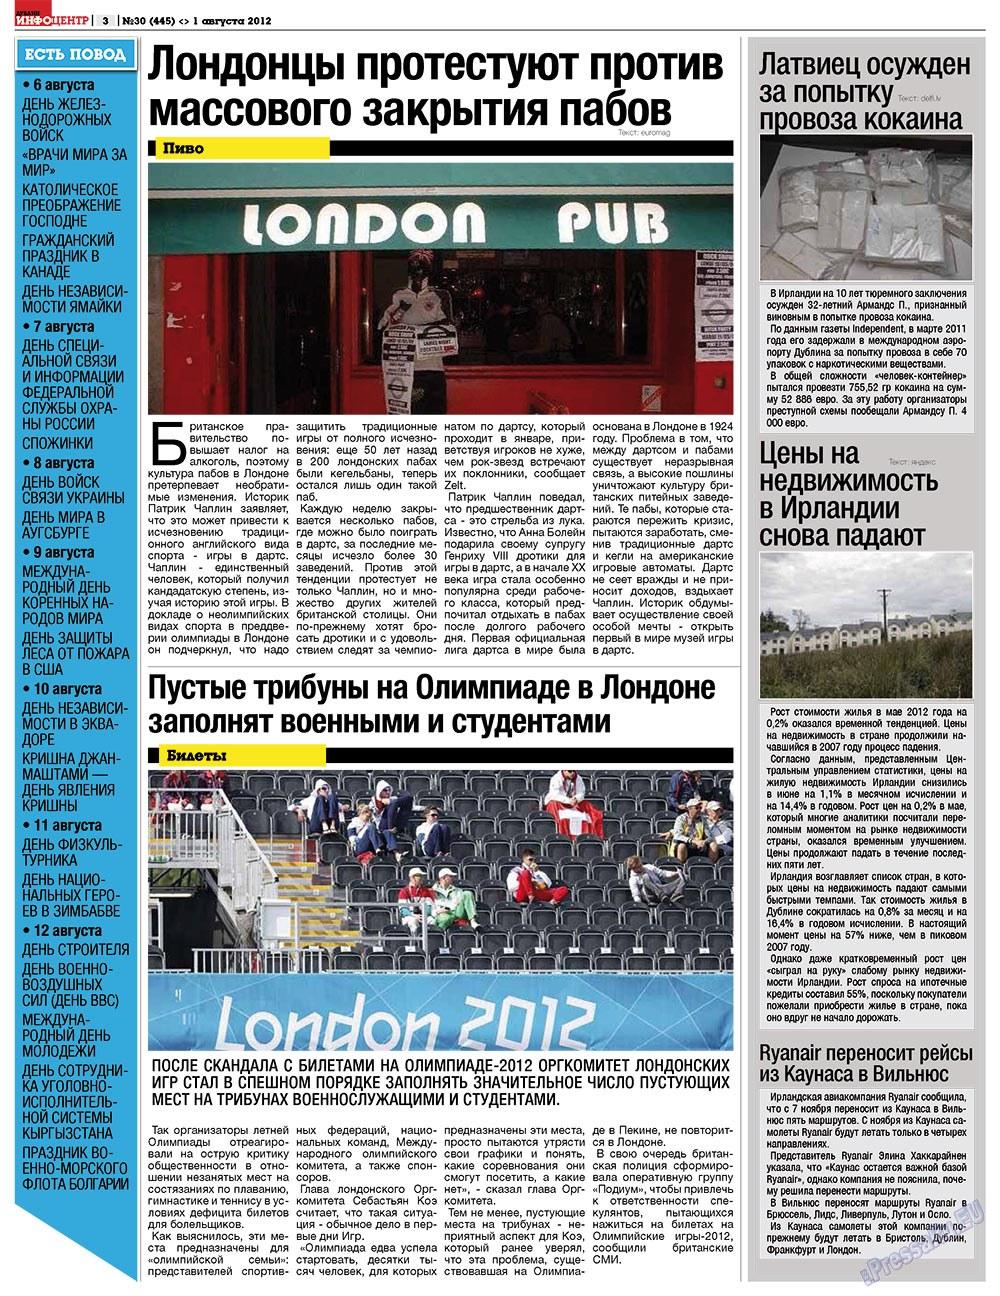 Дублин инфоцентр (газета). 2012 год, номер 30, стр. 3